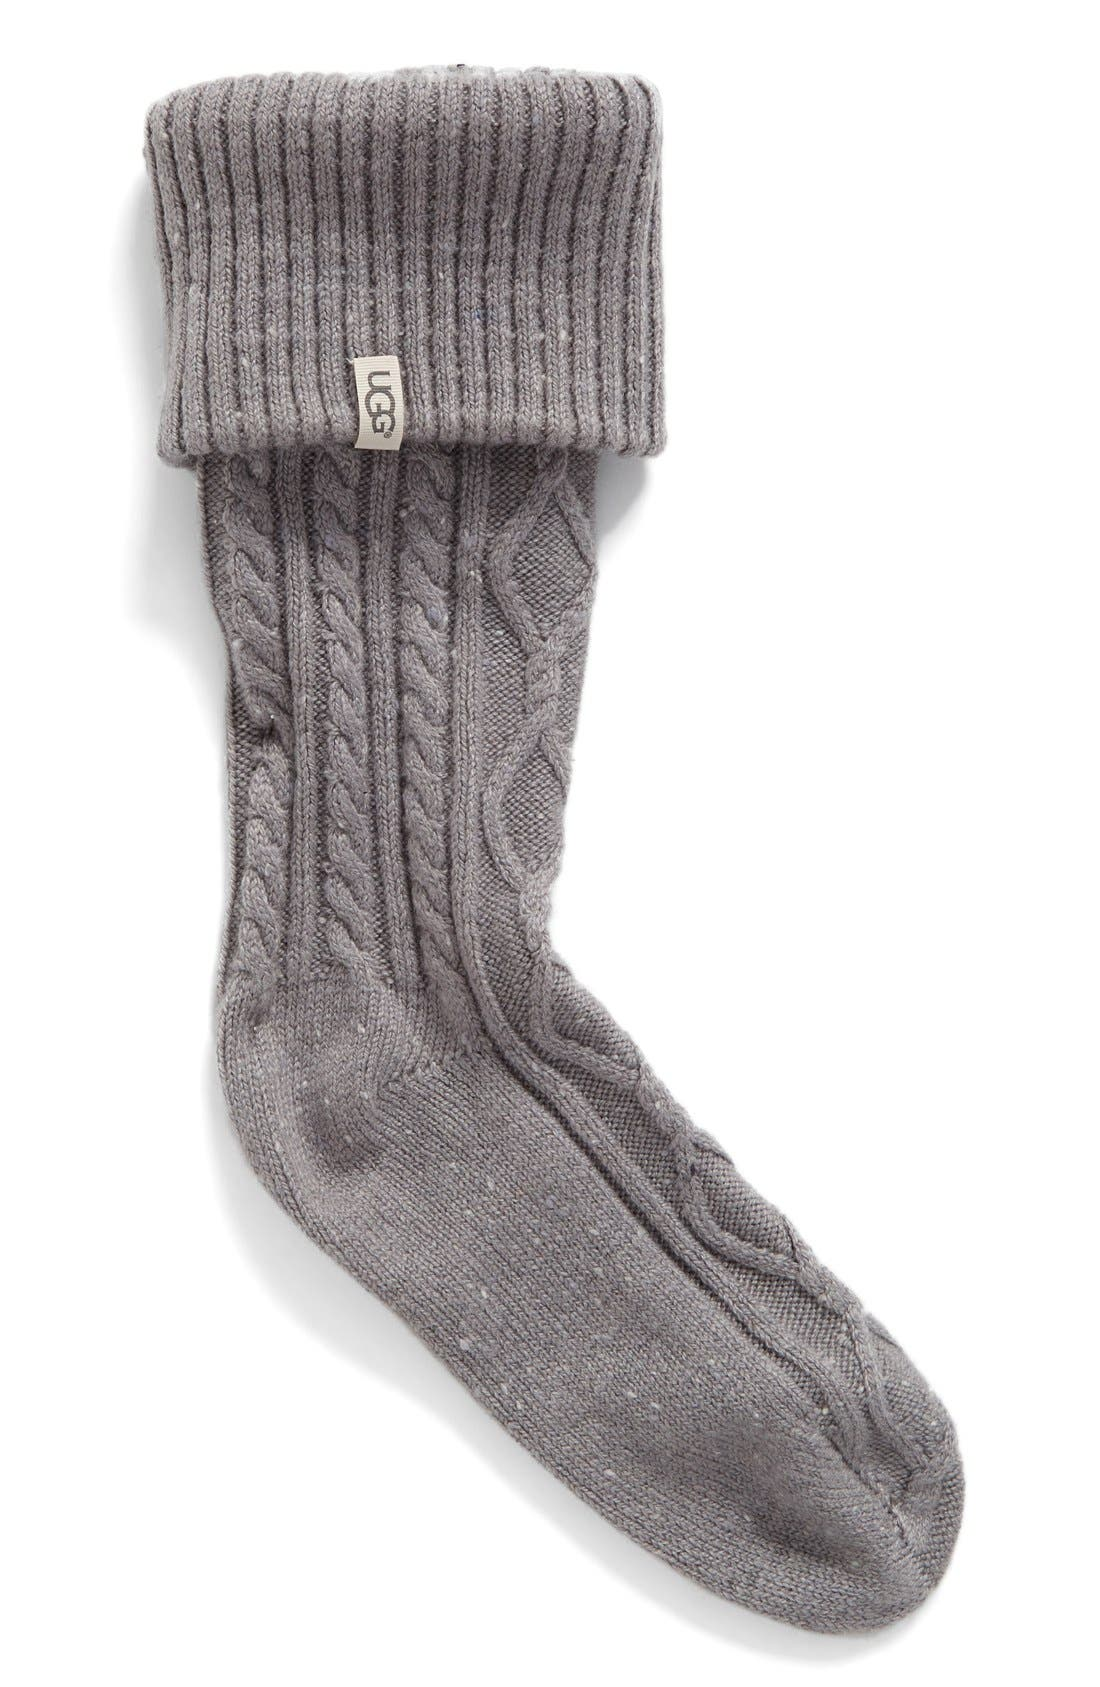 Main Image - UGG® 'Shaye' Tall Boot Socks (Women)